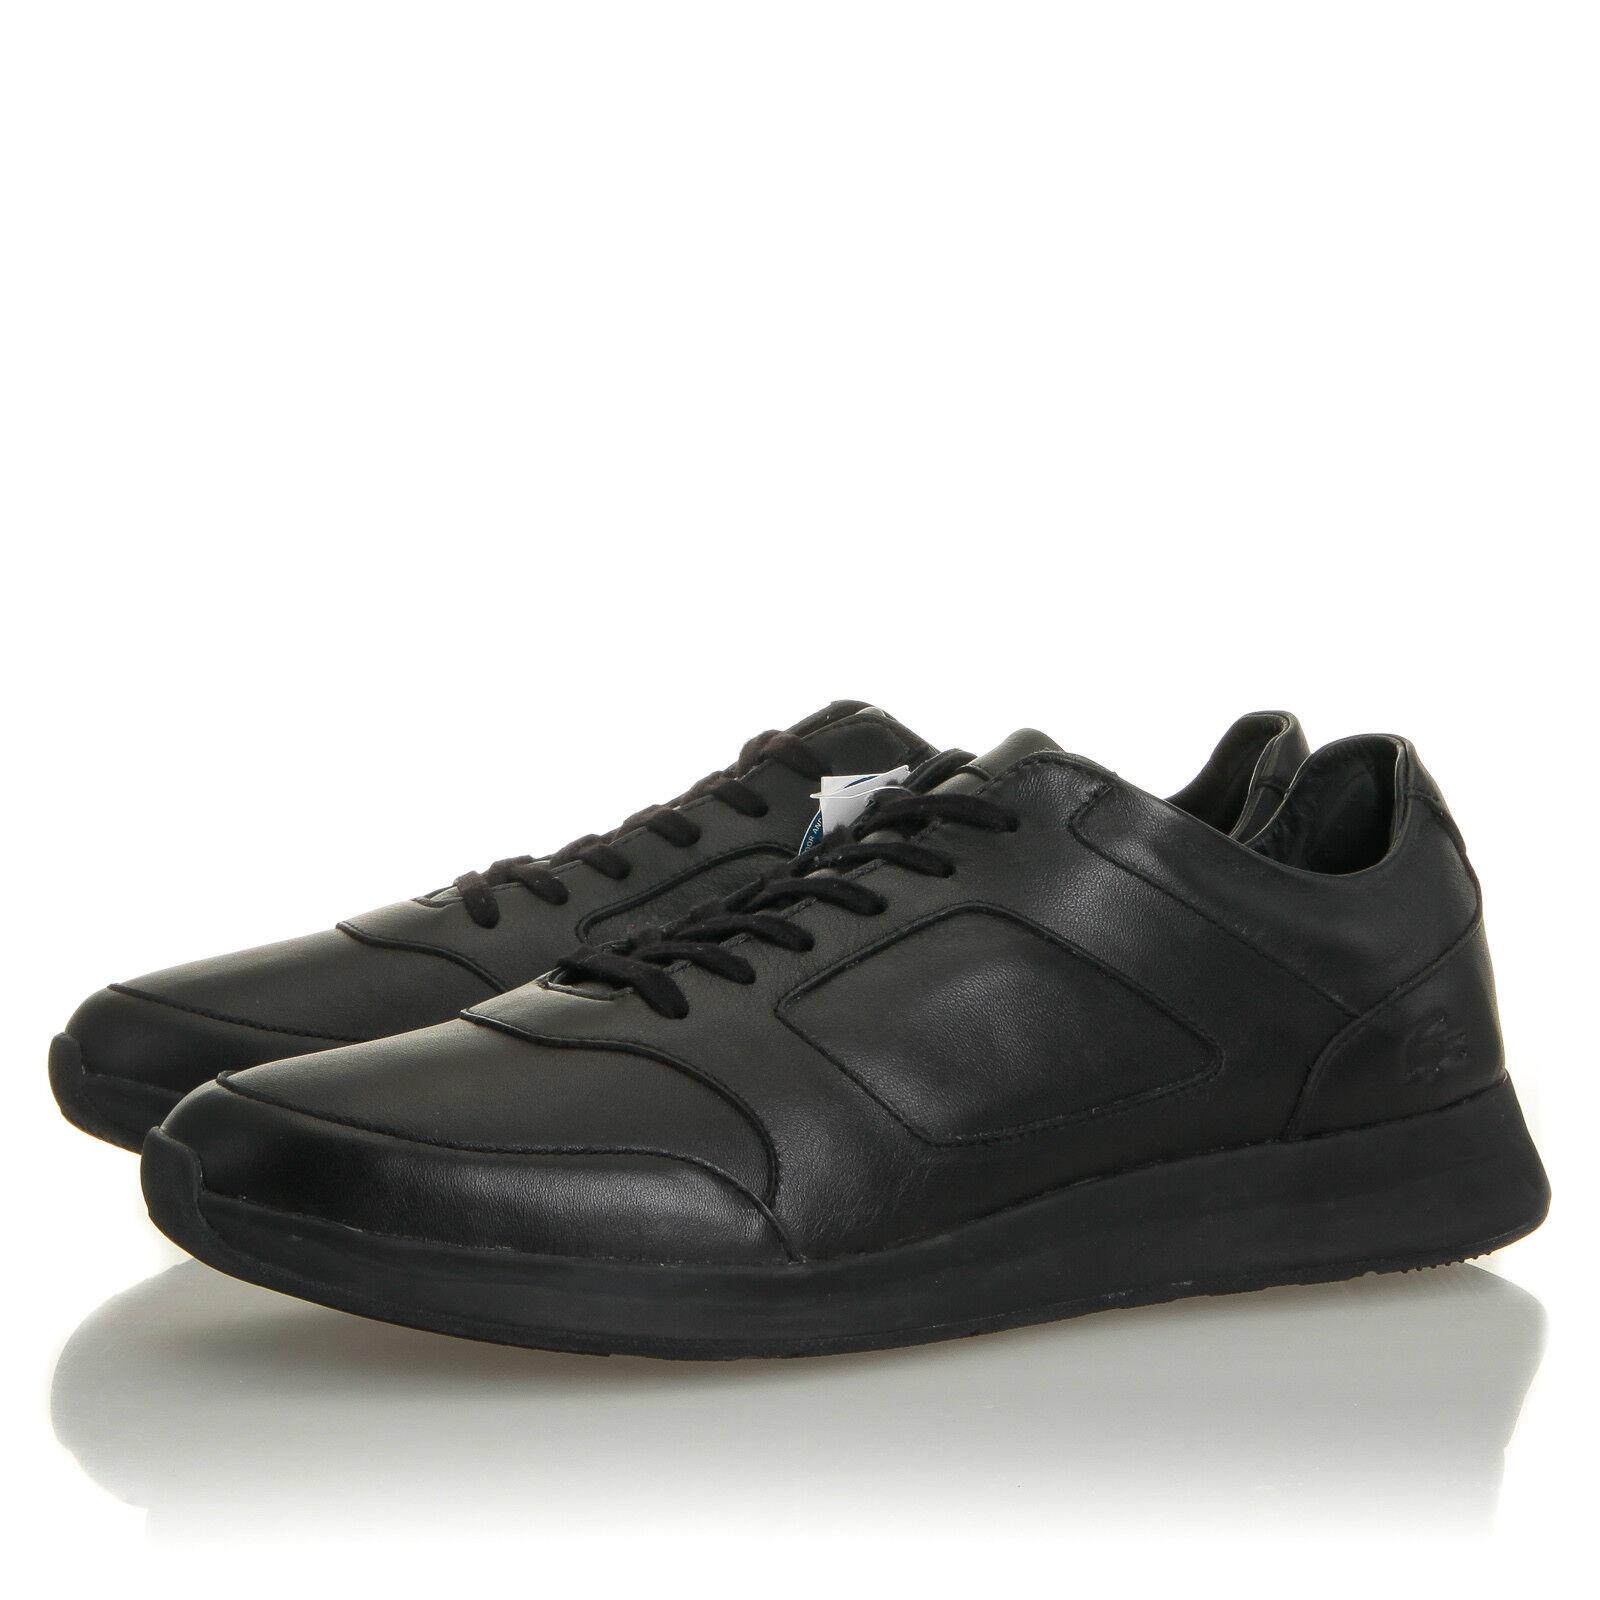 Lacoste Joggeur 316 Black Leather Sneaker - Mens 12